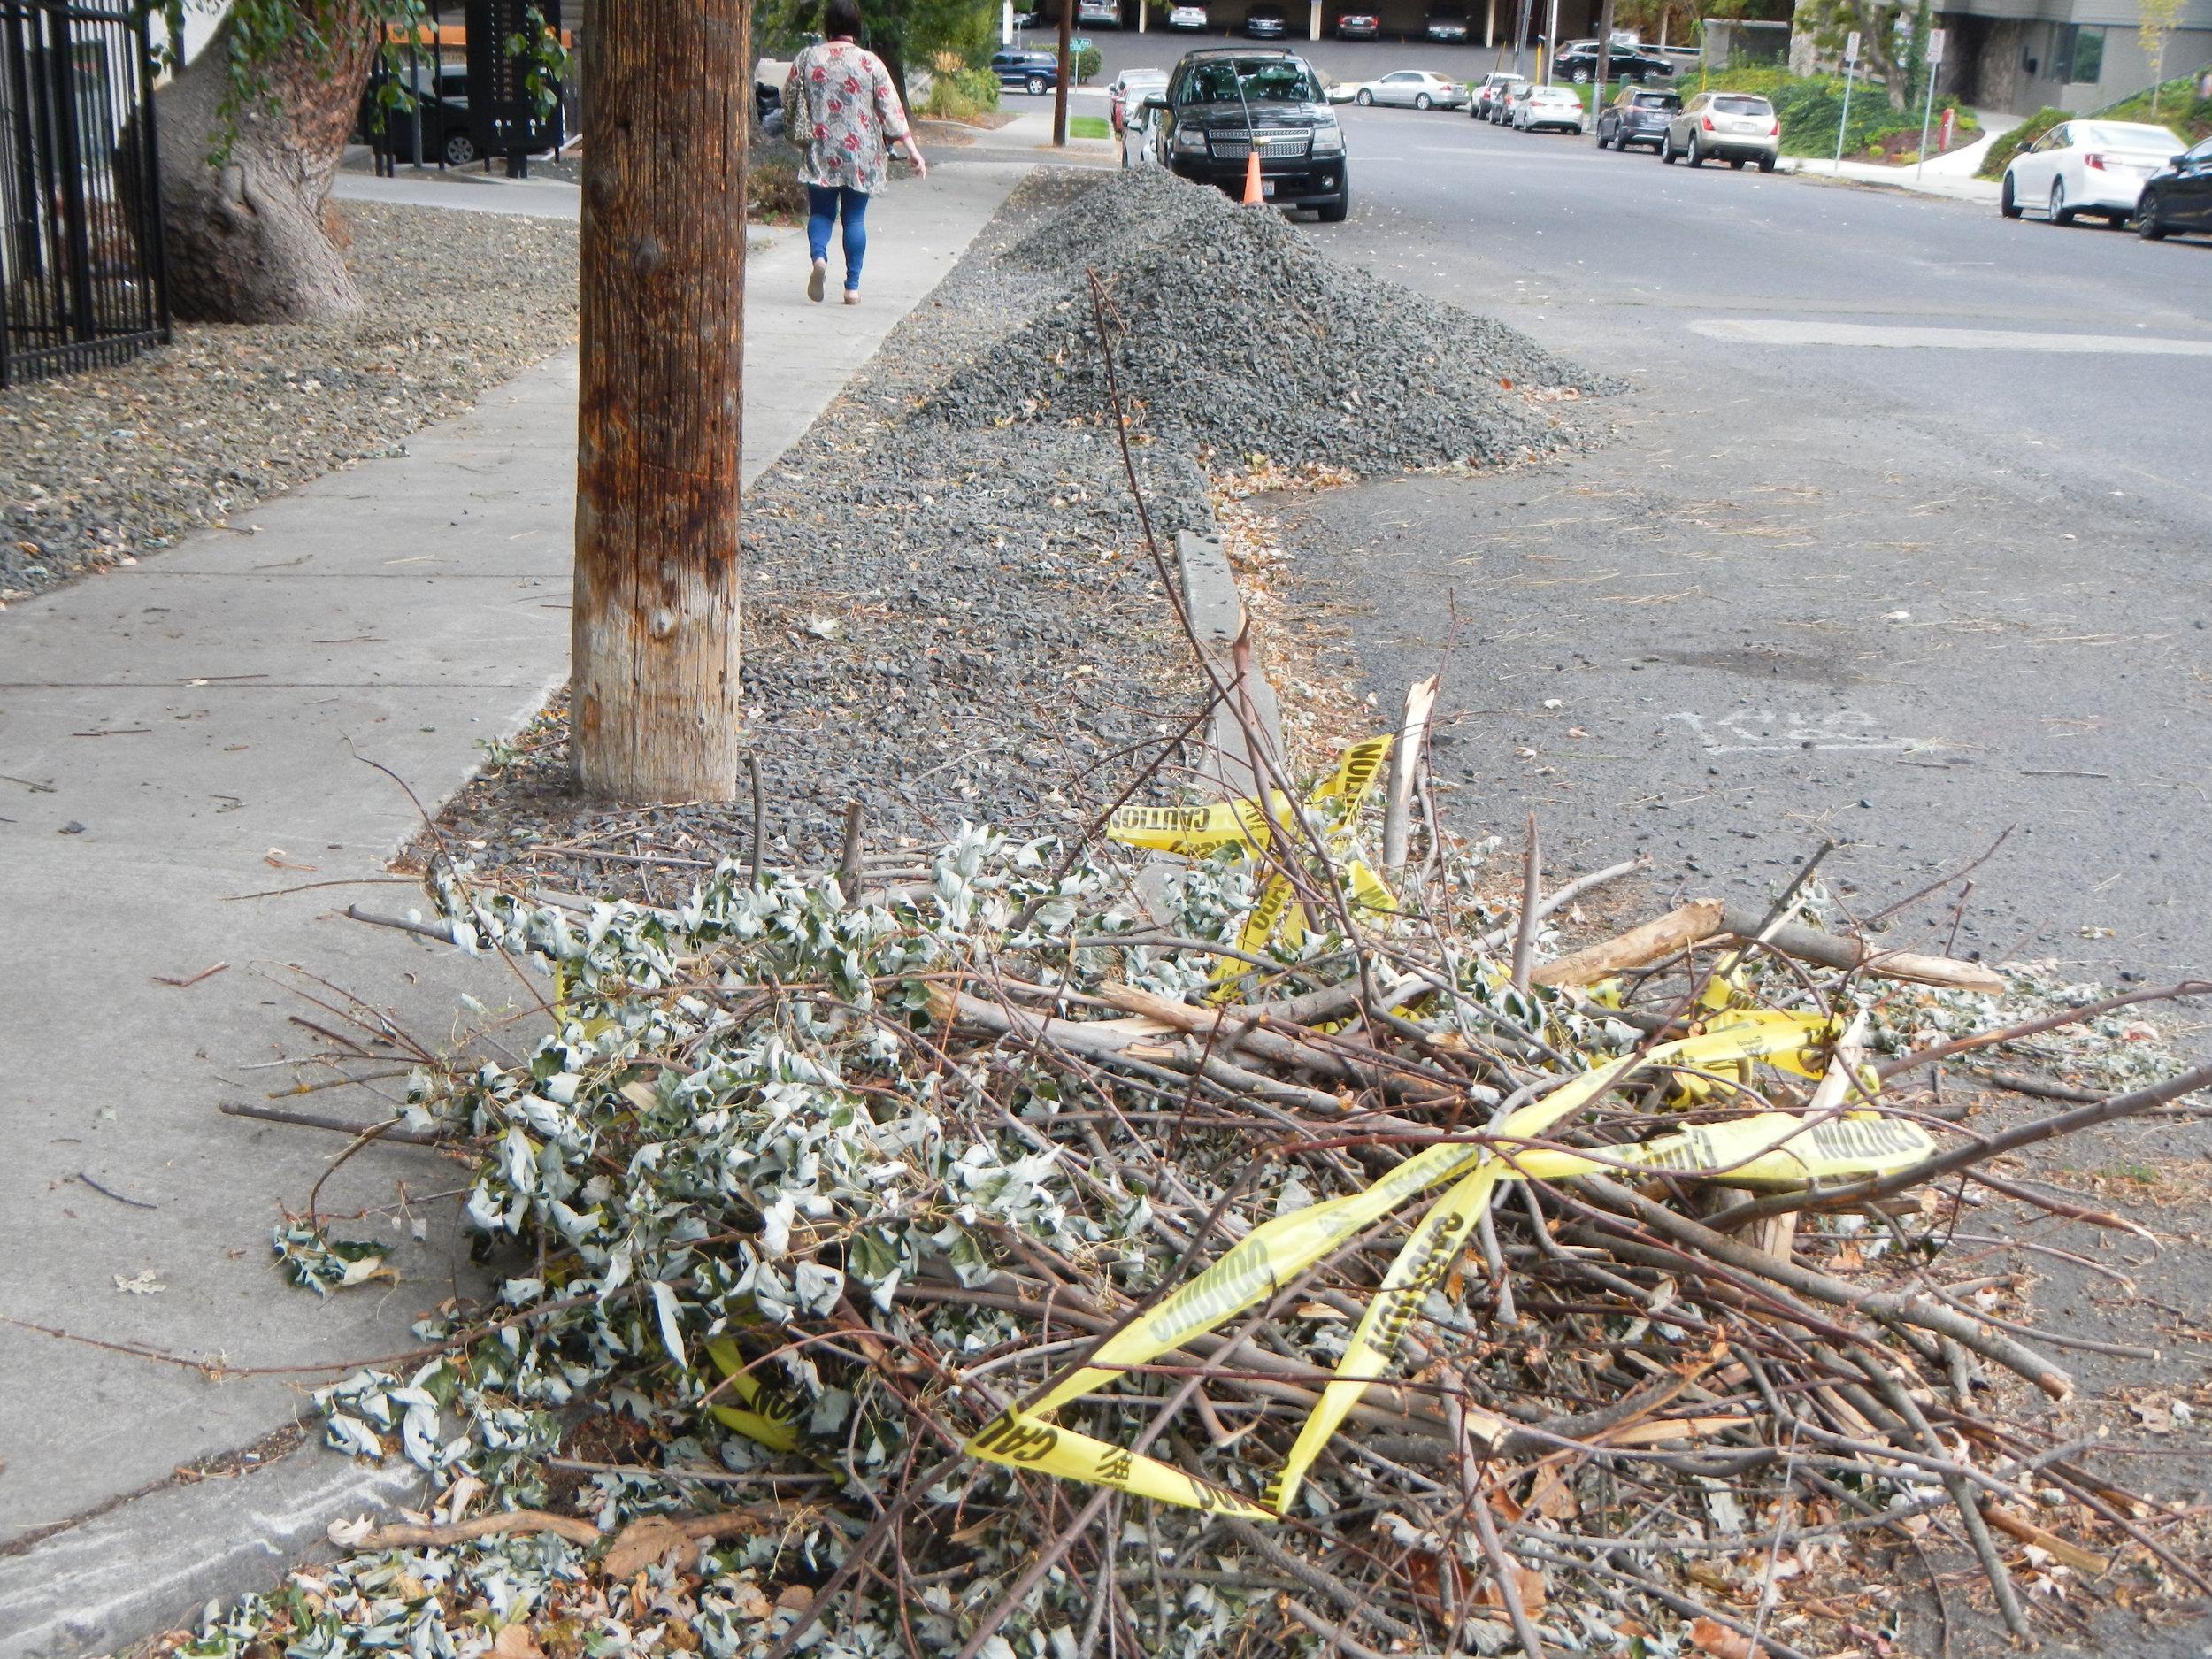 Debris blocking stormwater drain